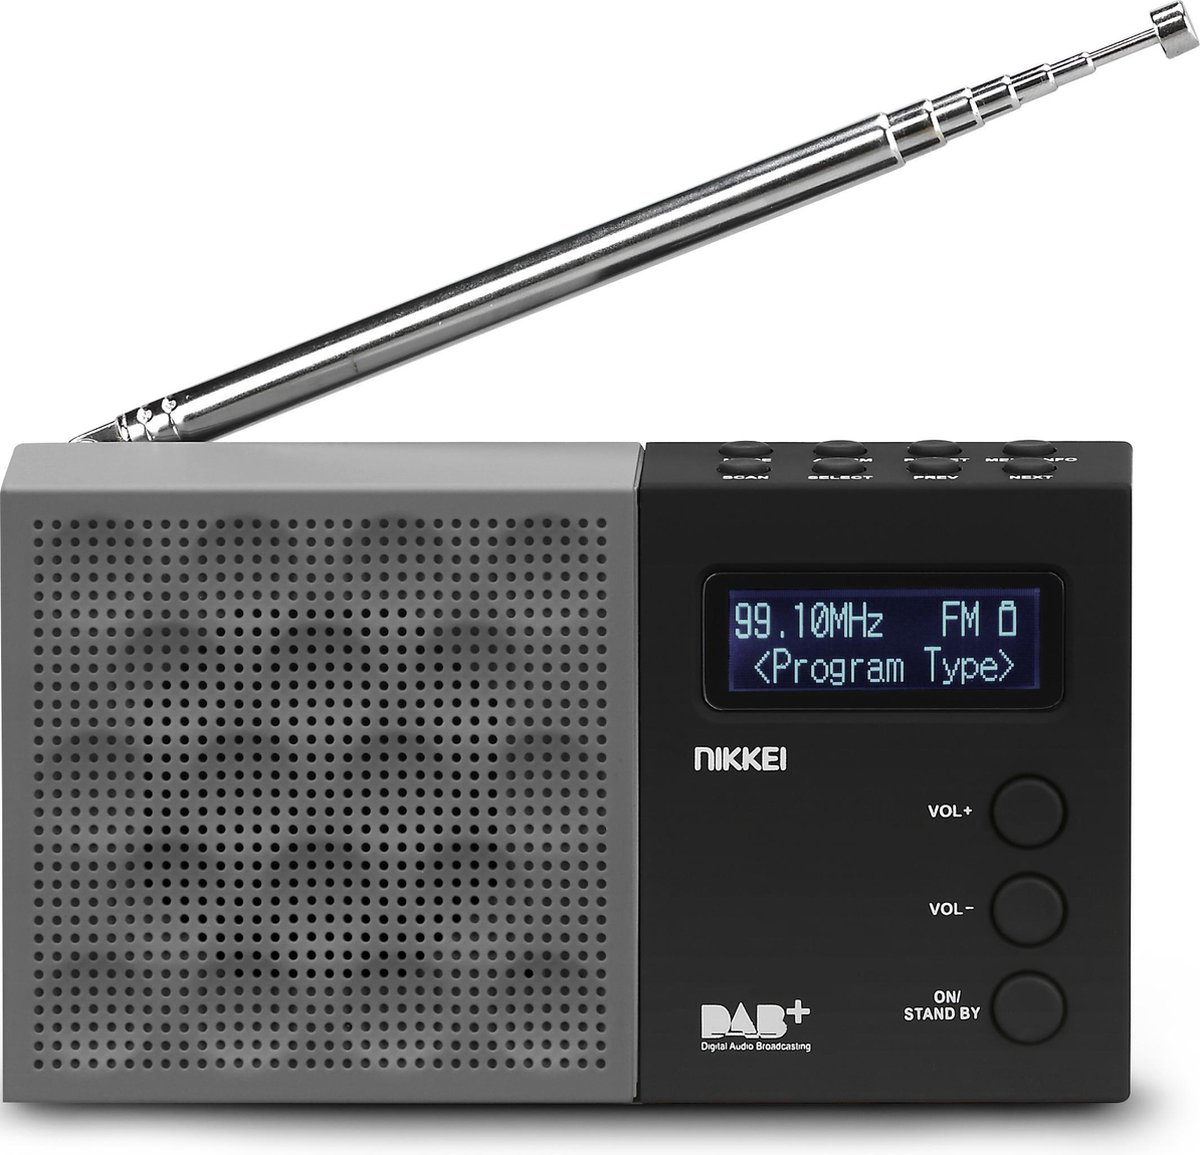 Nikkei NDB30BK - Draagbare DAB+ Radio met FM Wekkerradio - Zwart/Grijs